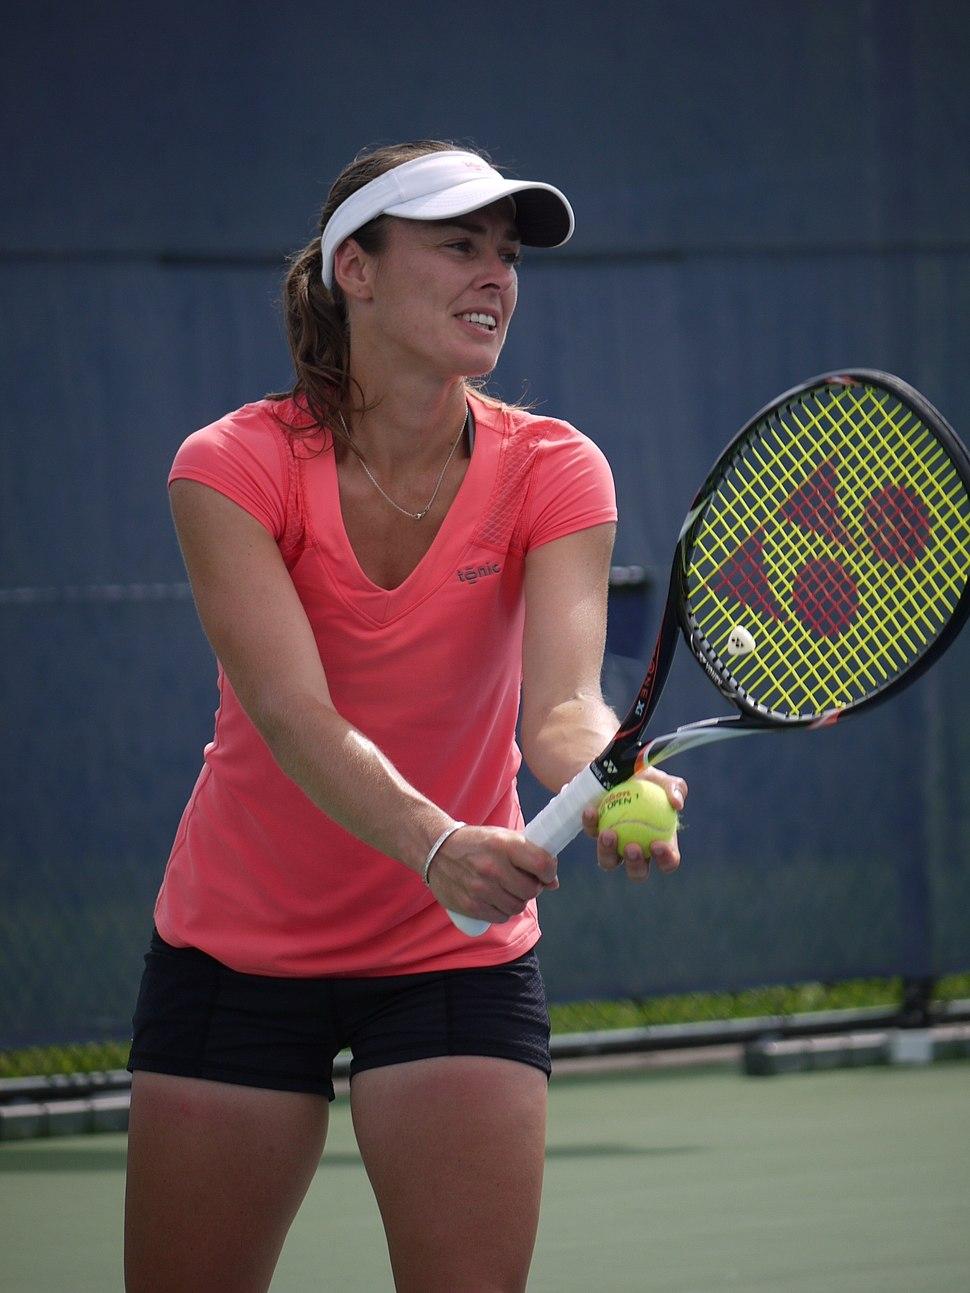 Martina Hingis 2013 Rogers Cup practice